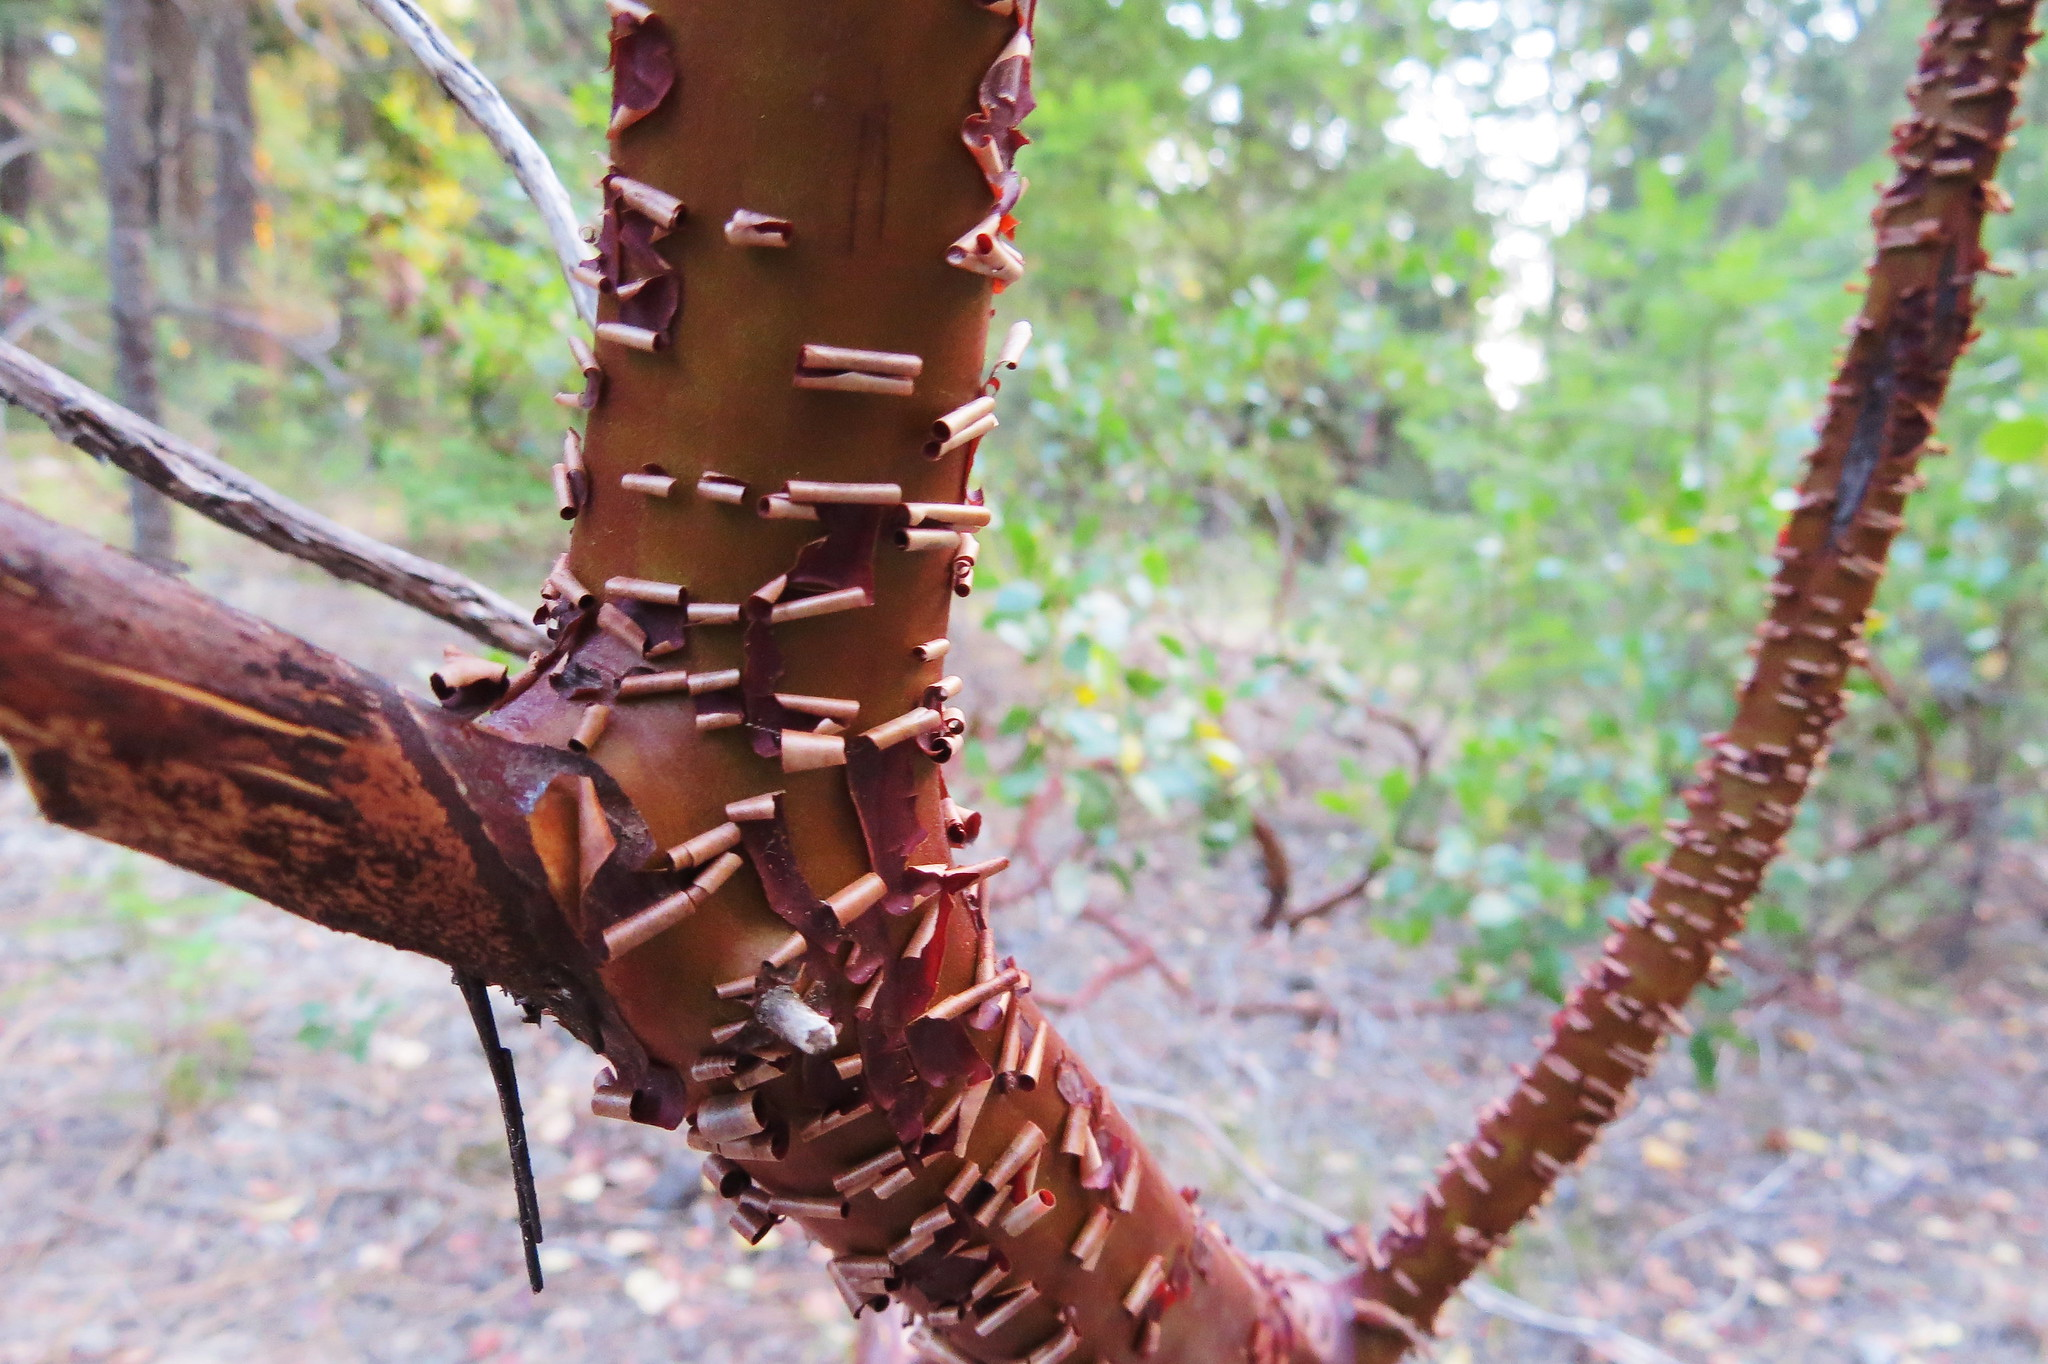 Manzanita Tree, Rogue River Forest, Oregon